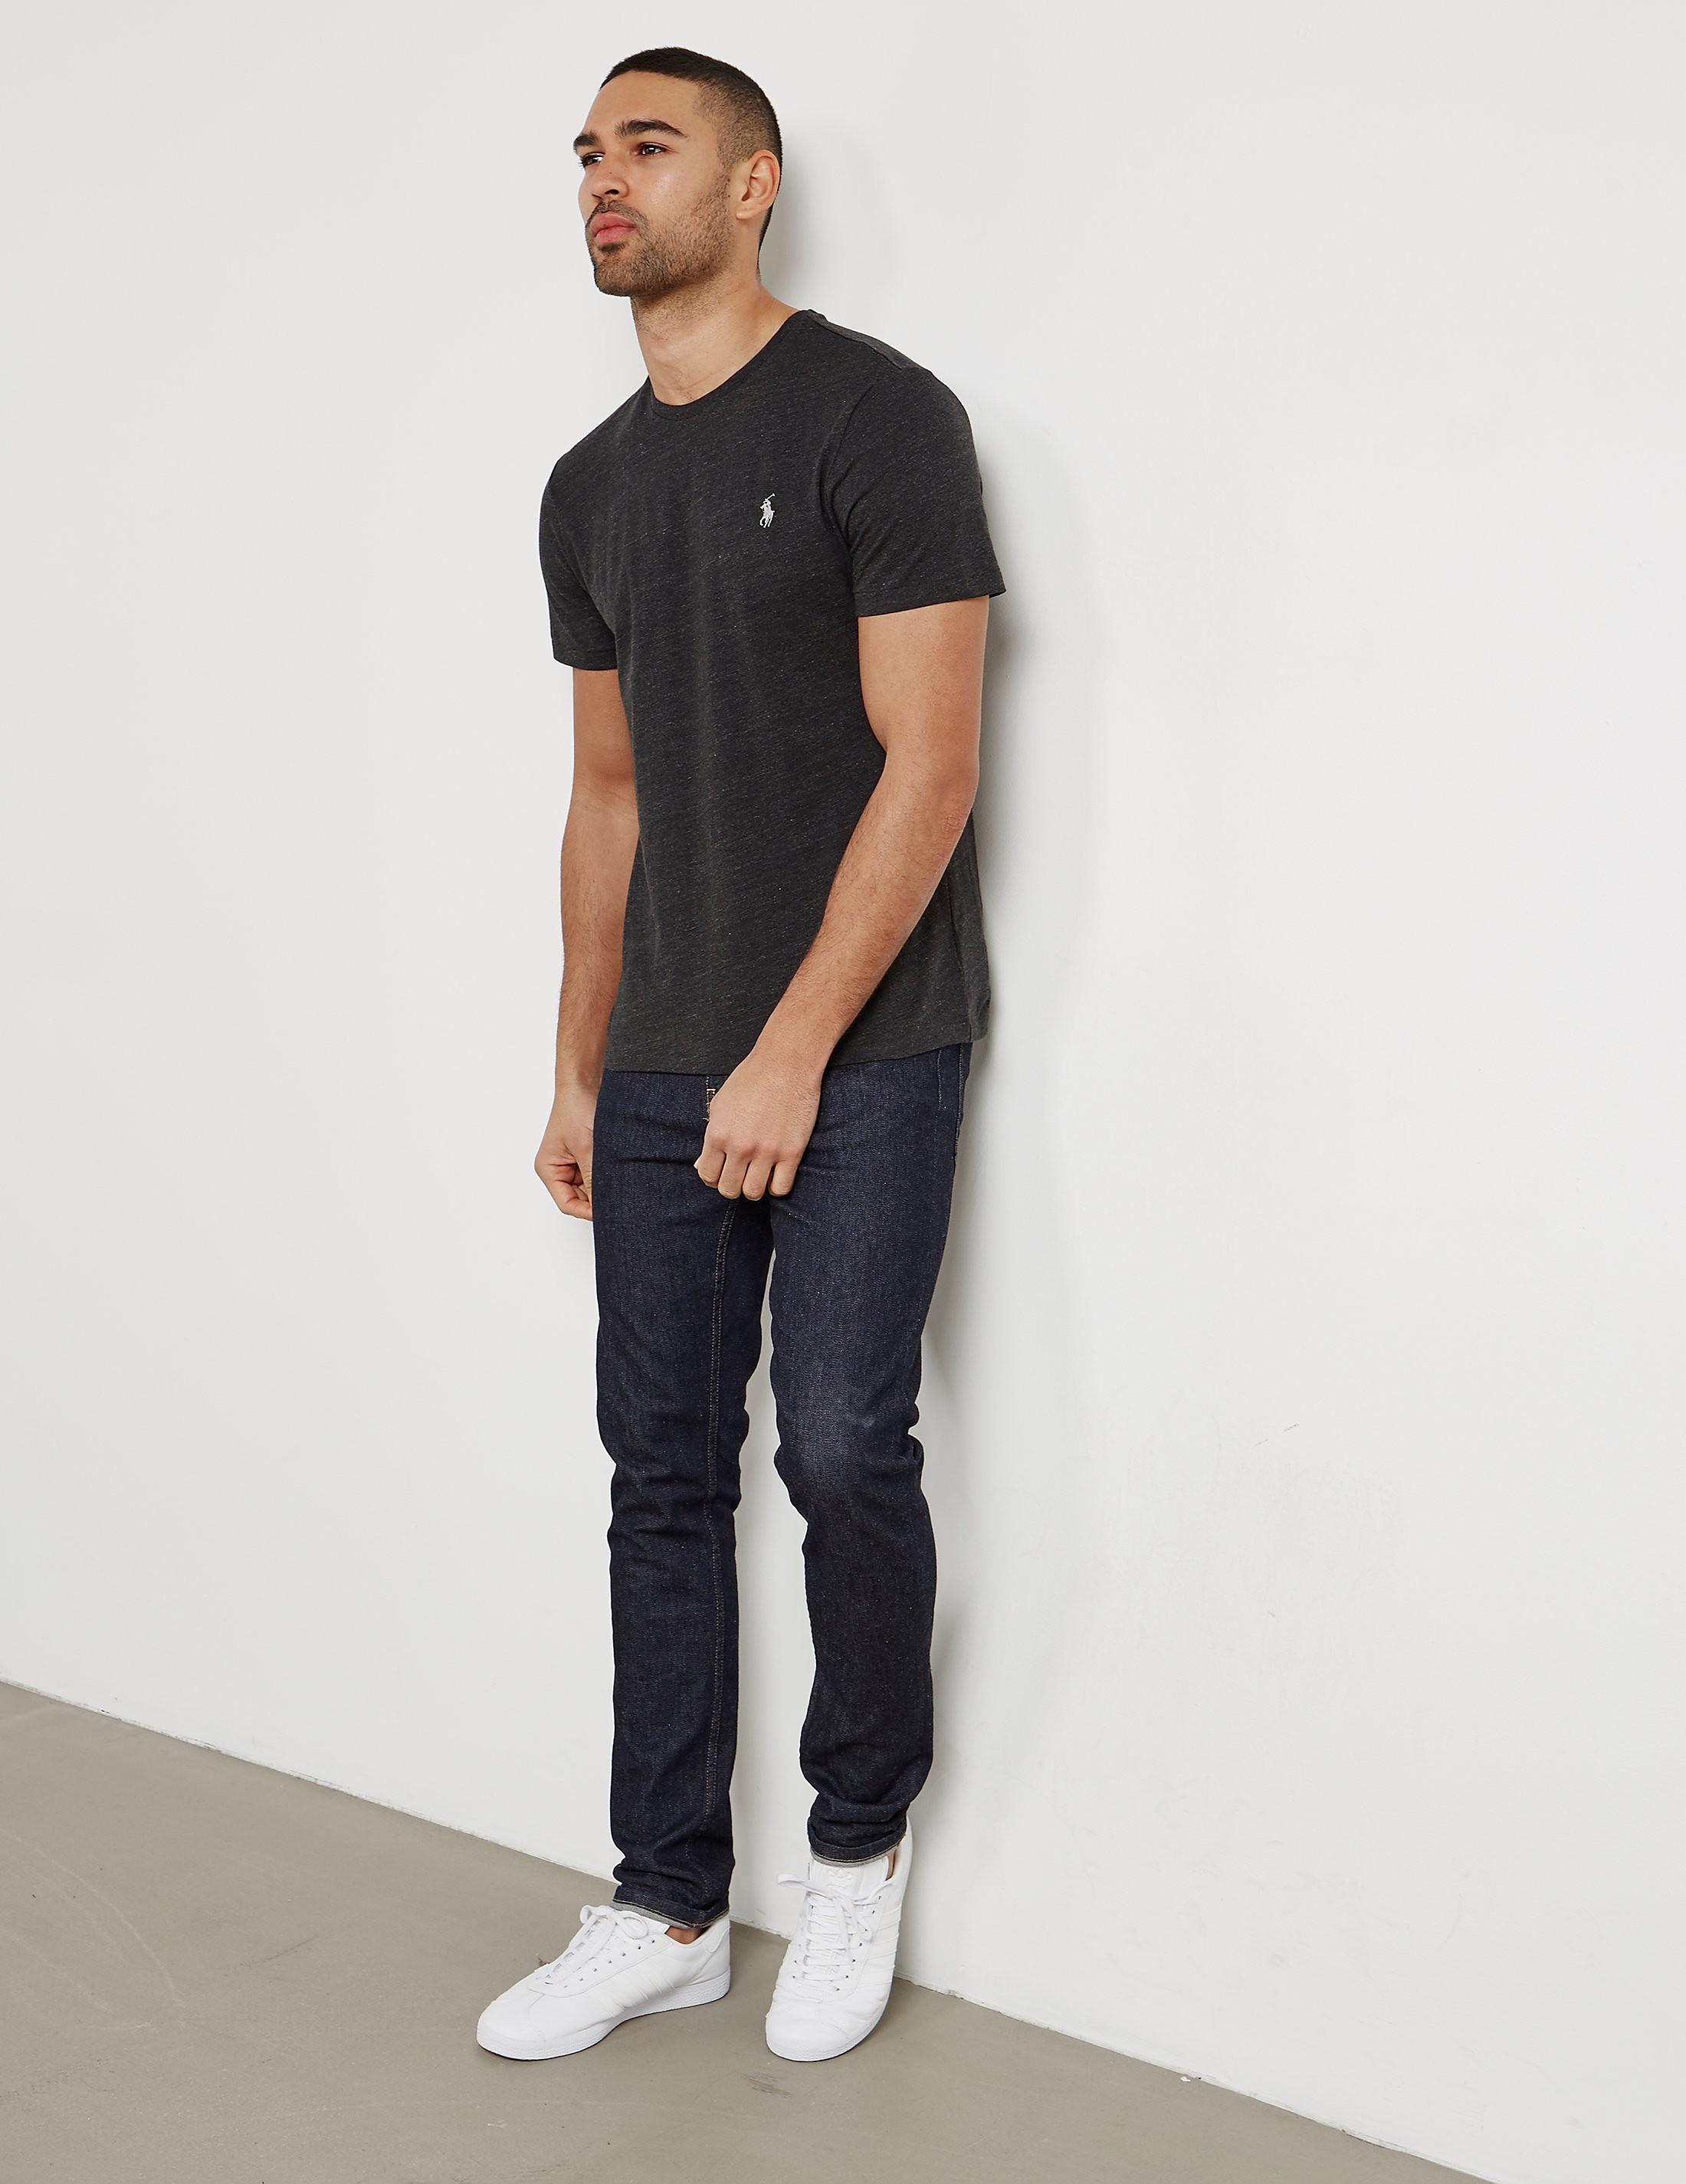 Mens Polo Ralph Lauren Crew Neck Short Sleeve T Shirt Black Black